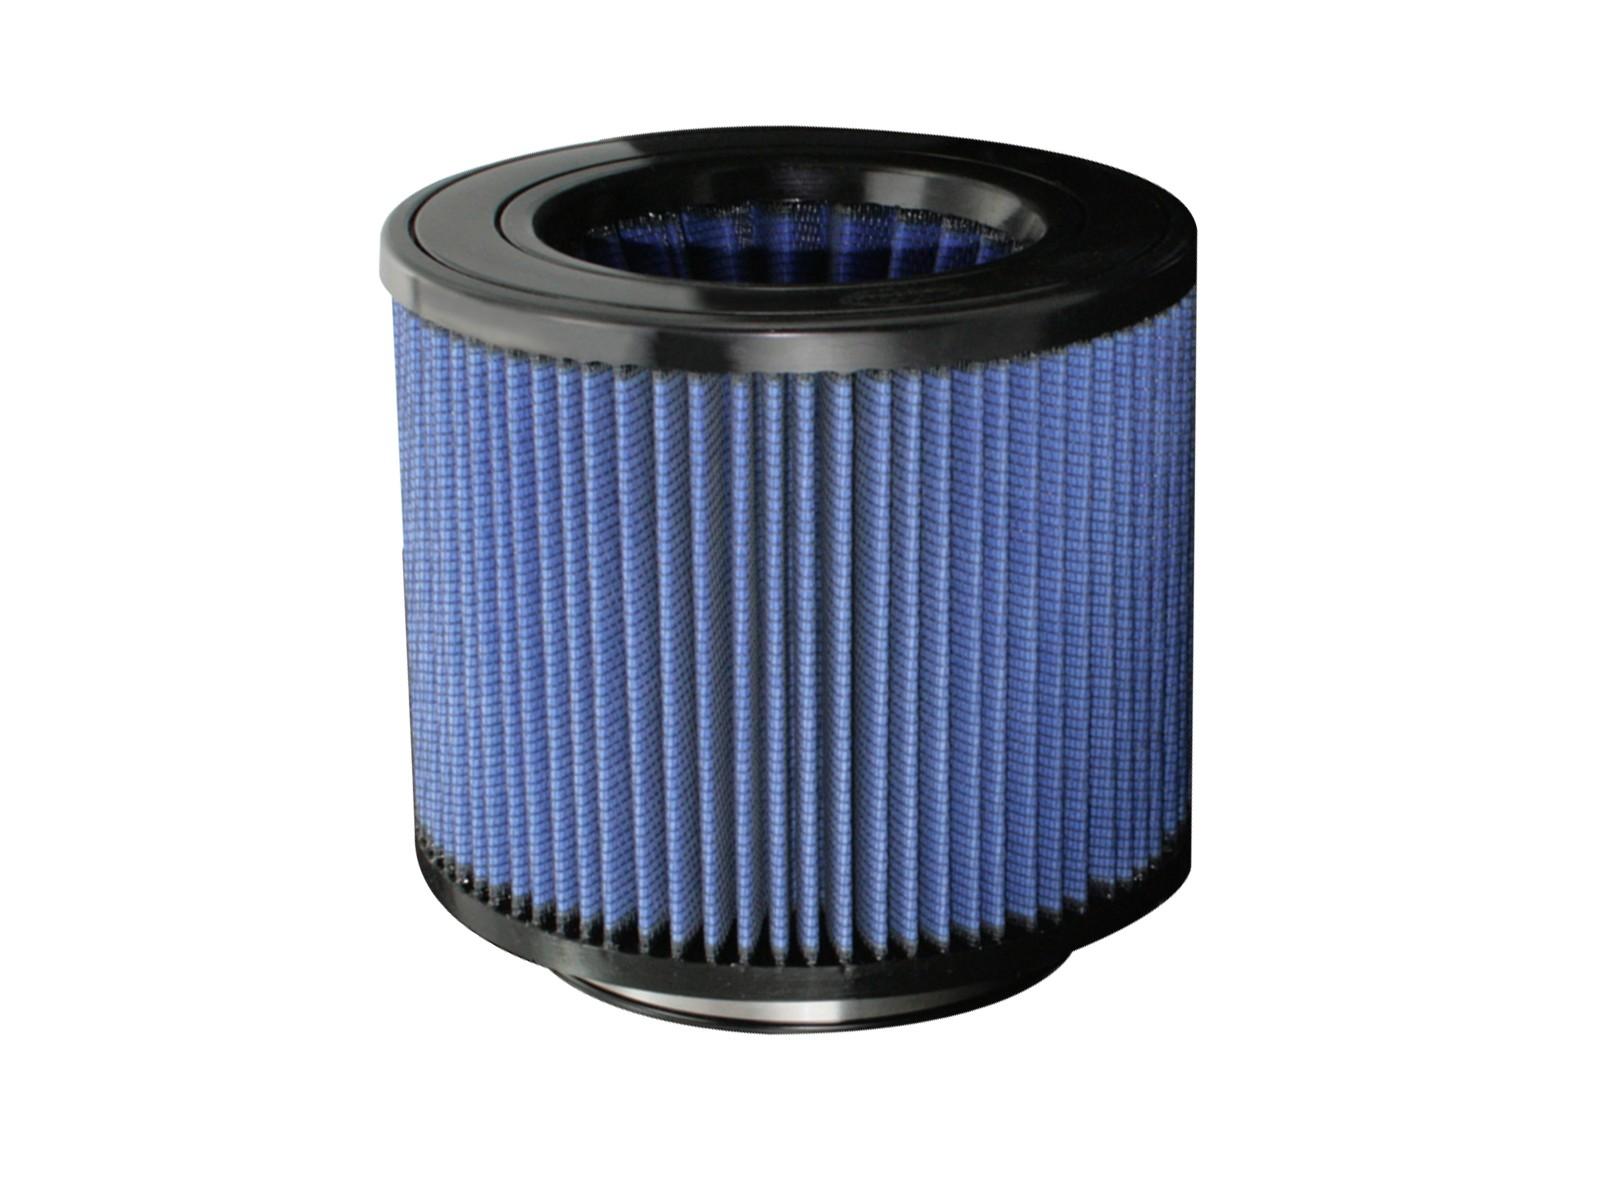 aFe POWER 24-91046 Magnum FLOW Pro 5R Air Filter